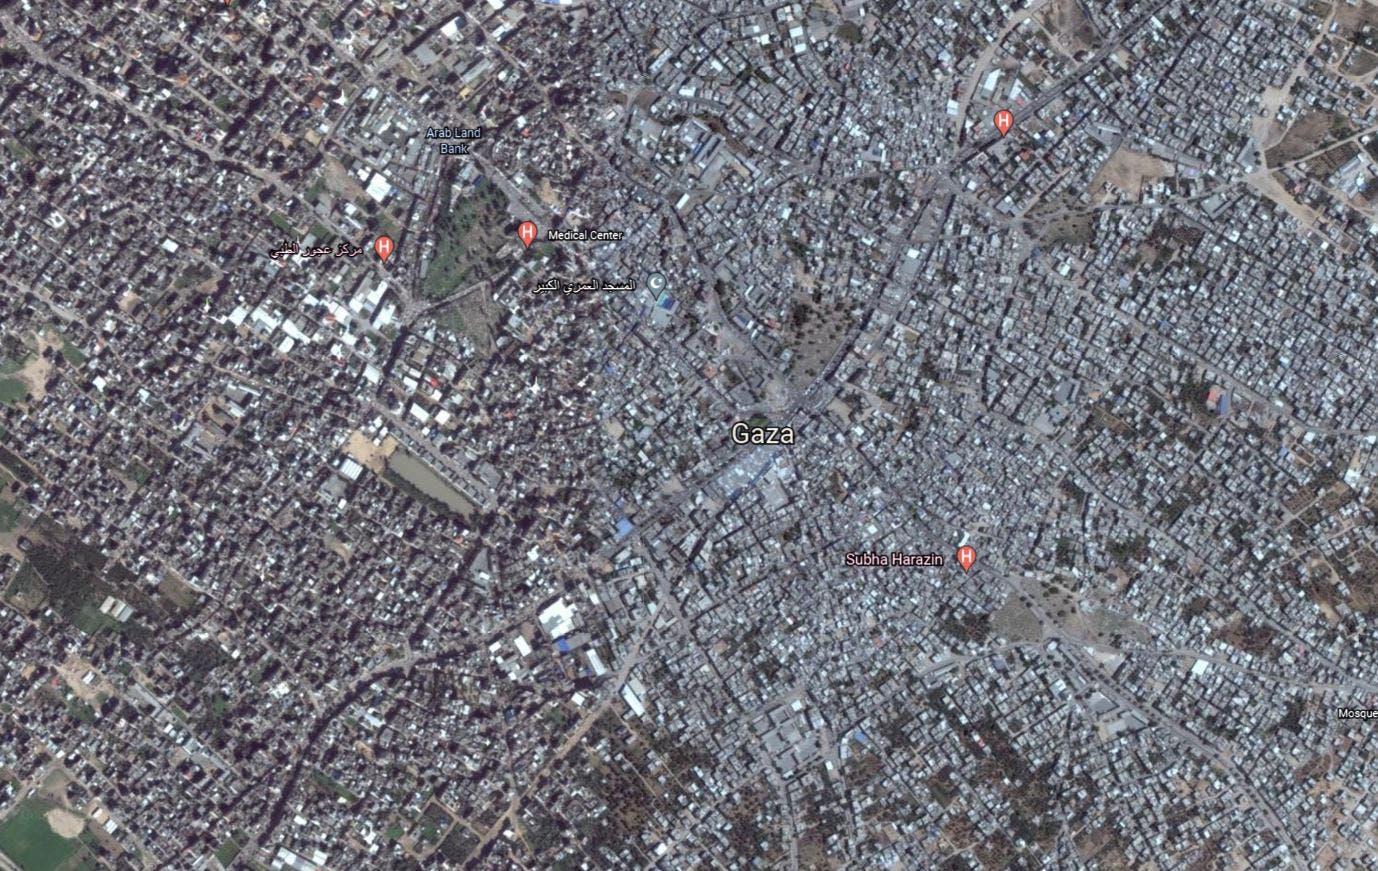 غزة (خرائط غوغل)